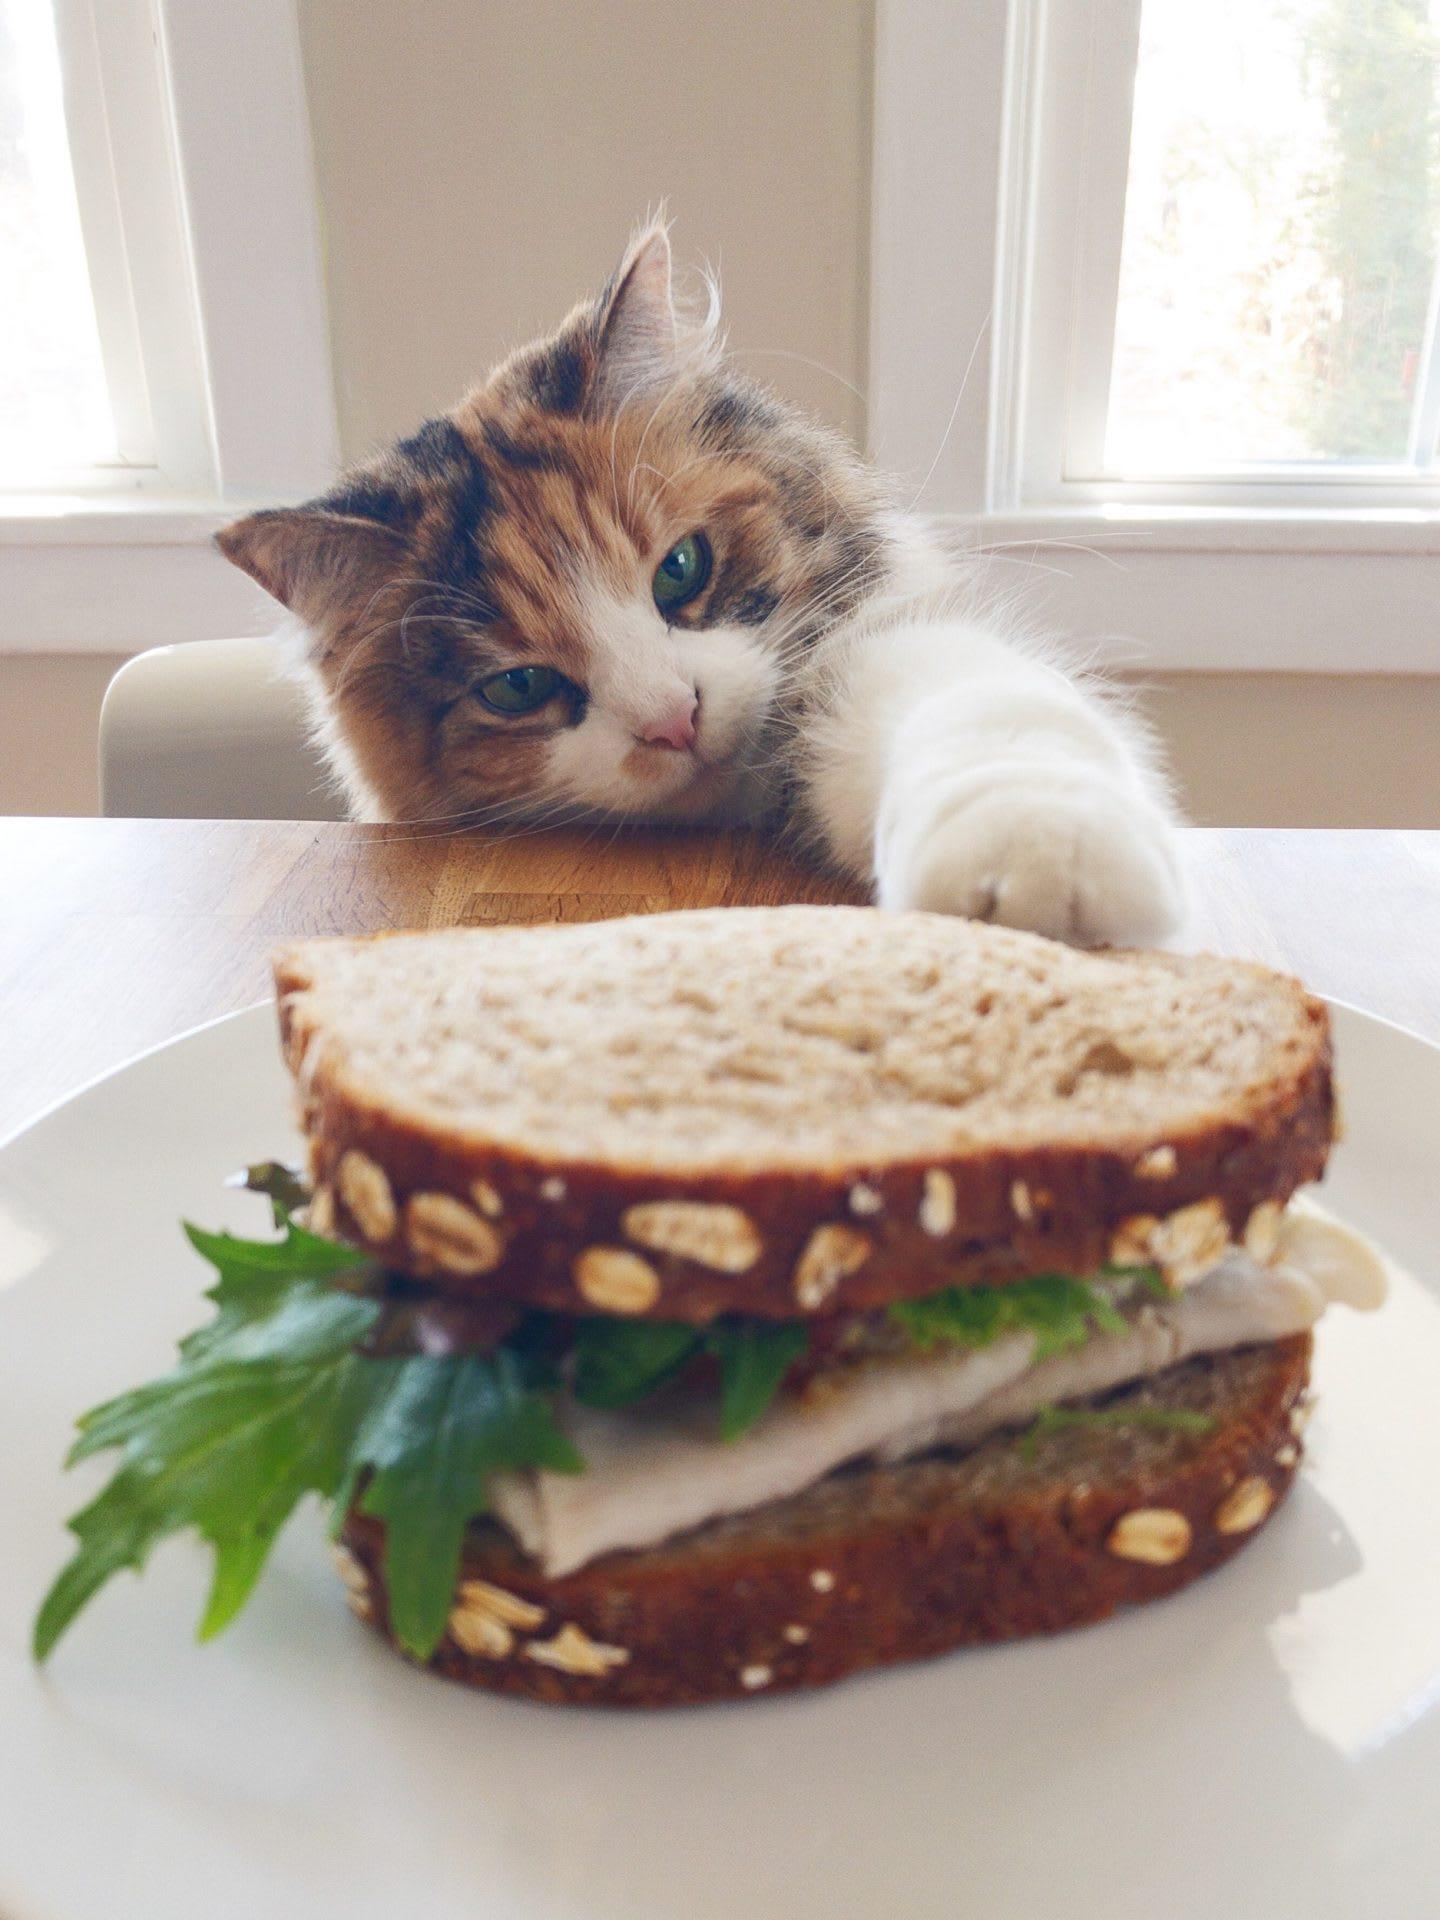 Fluffy cat touching a sandwich with paw, cute, animal, pet, kitten